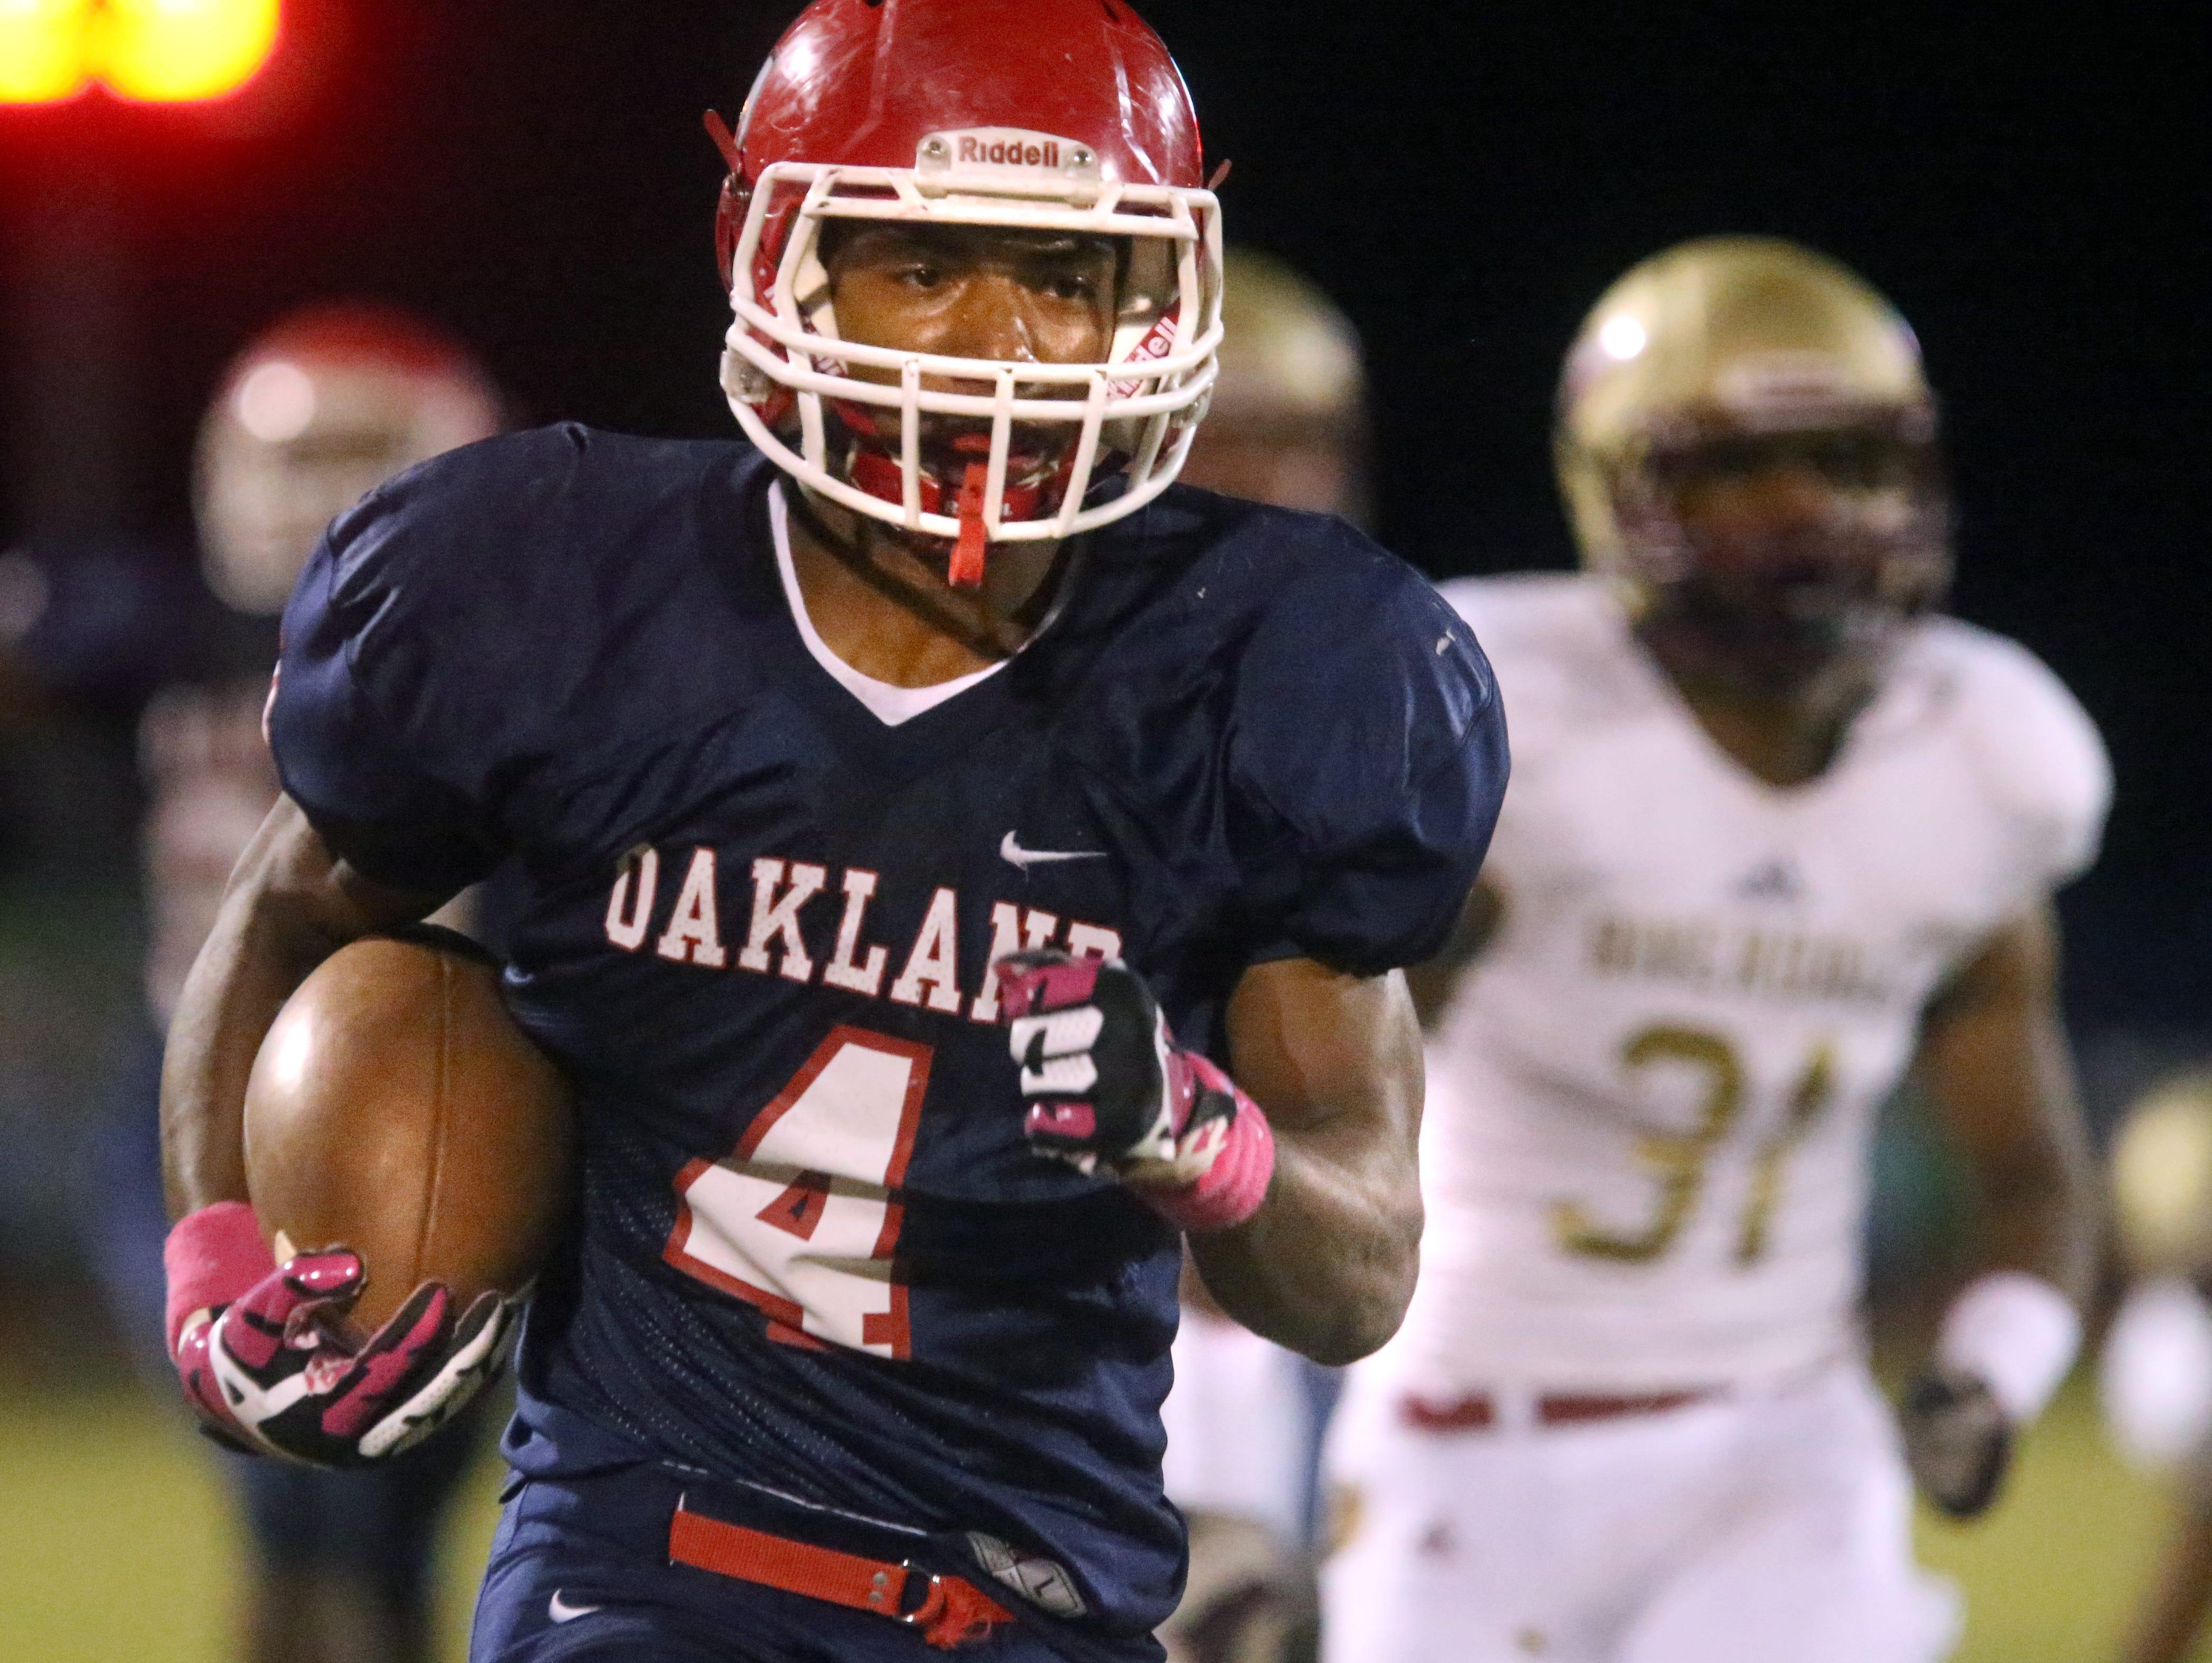 Oakland running back Lazarius Patterson (4).